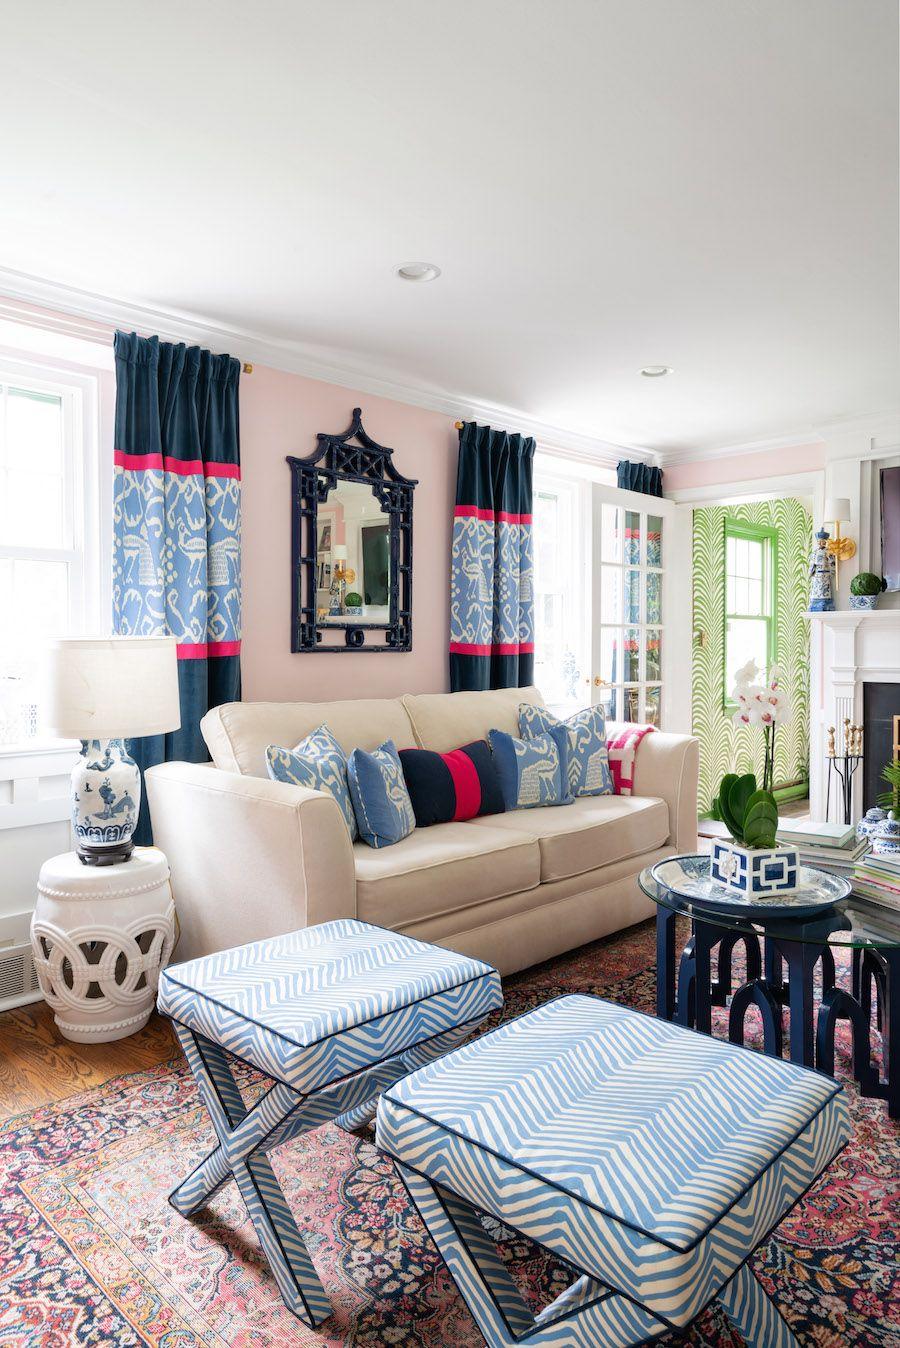 Happy Home Tour Meredith S Vibrant Retreat Jill Sorensen Lifestyle Brand Interior Designer In 2020 Preppy Decor Couches Living Room Modern Living Room